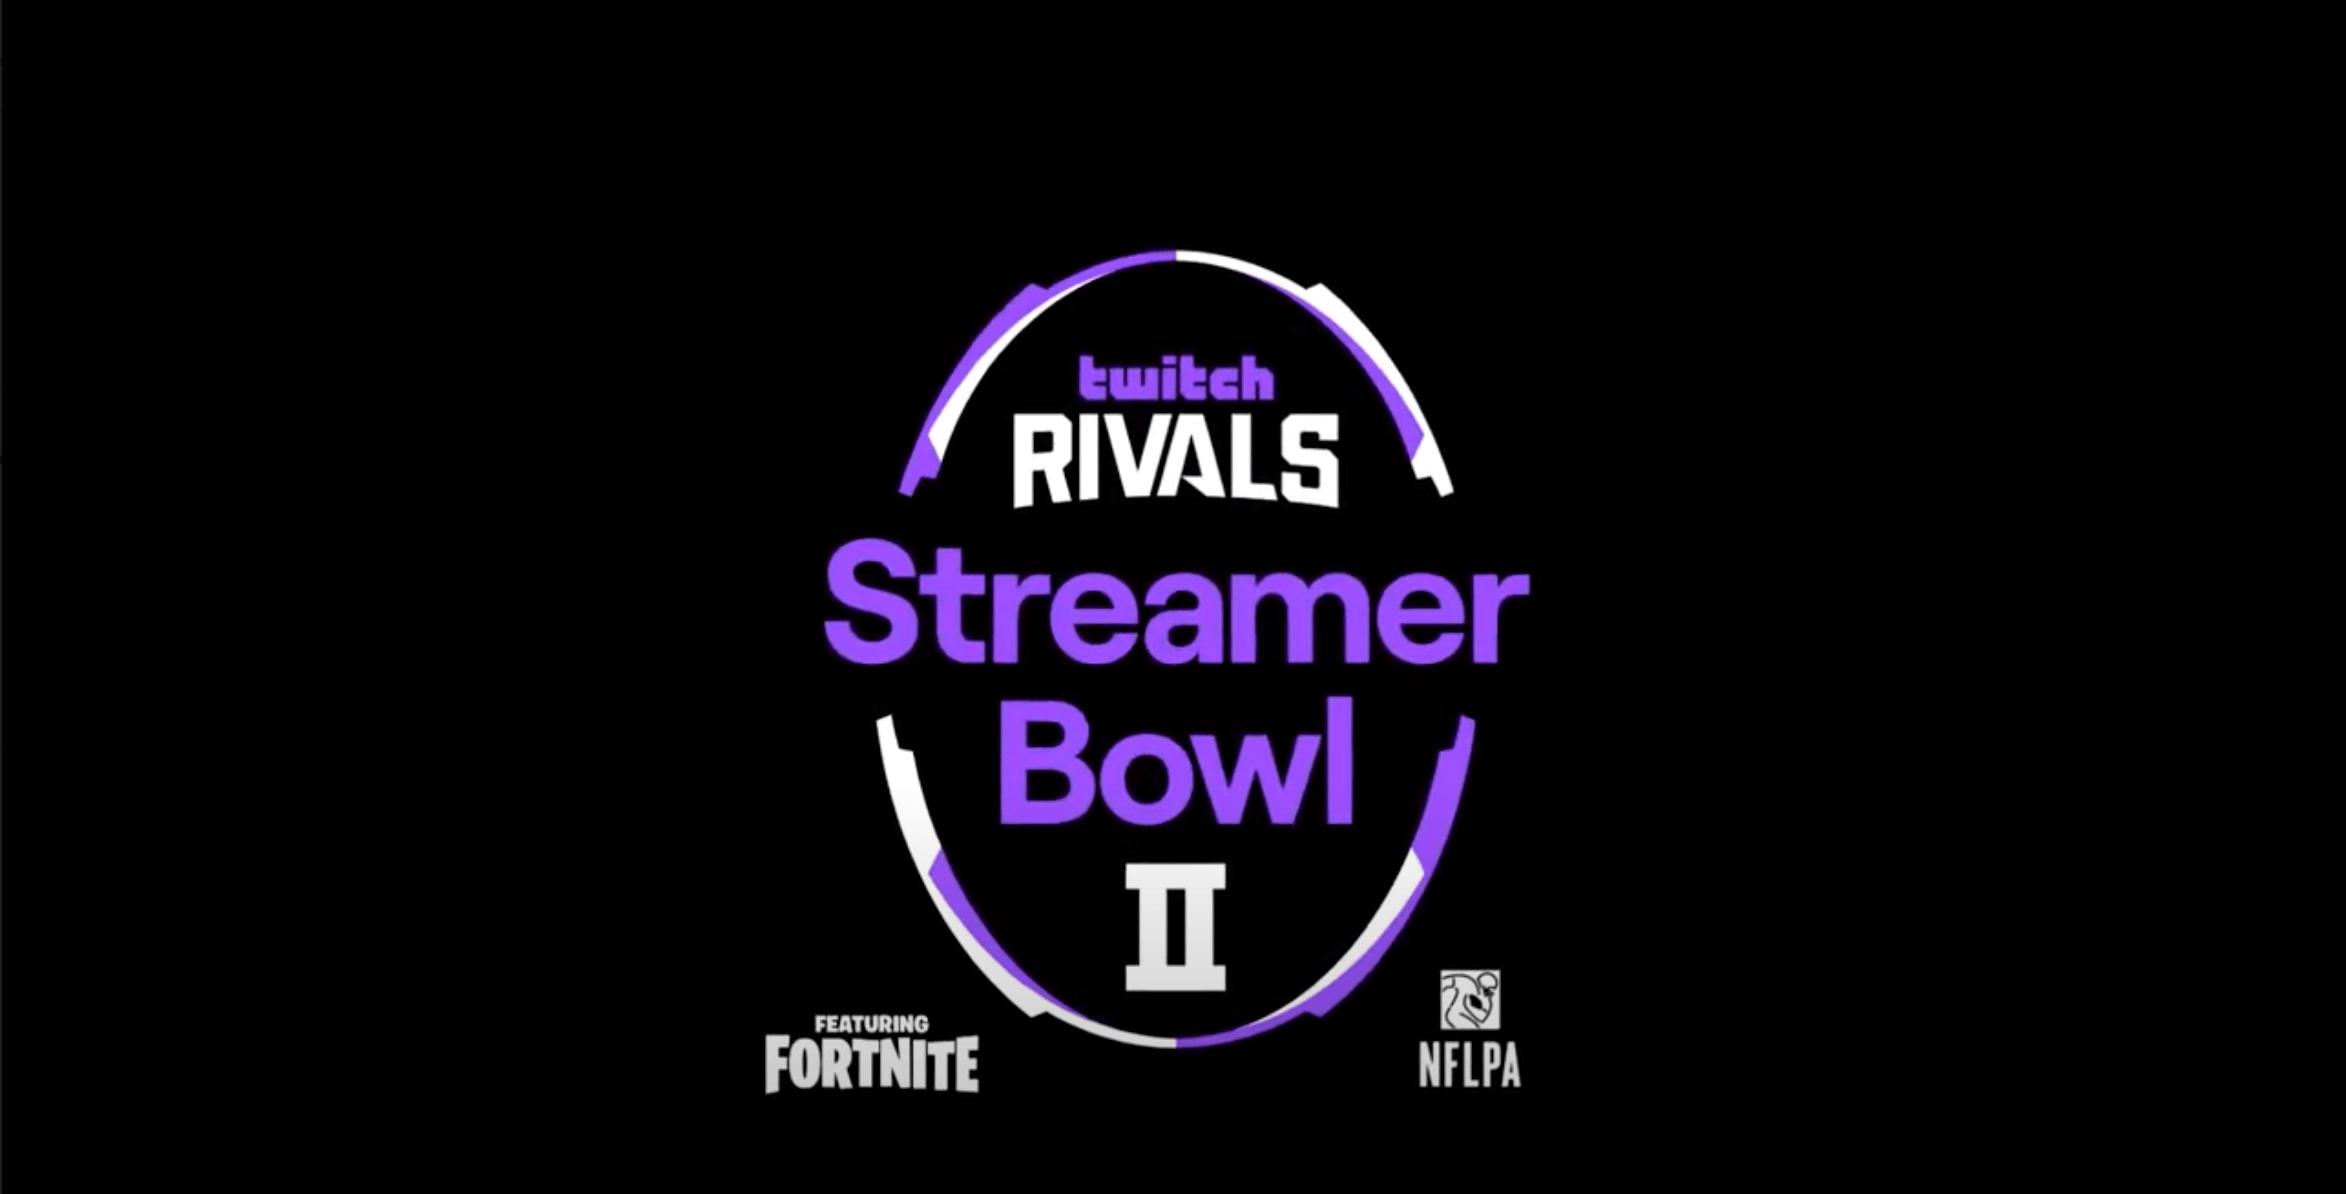 Torneio Twitch Rivals de Fortnite